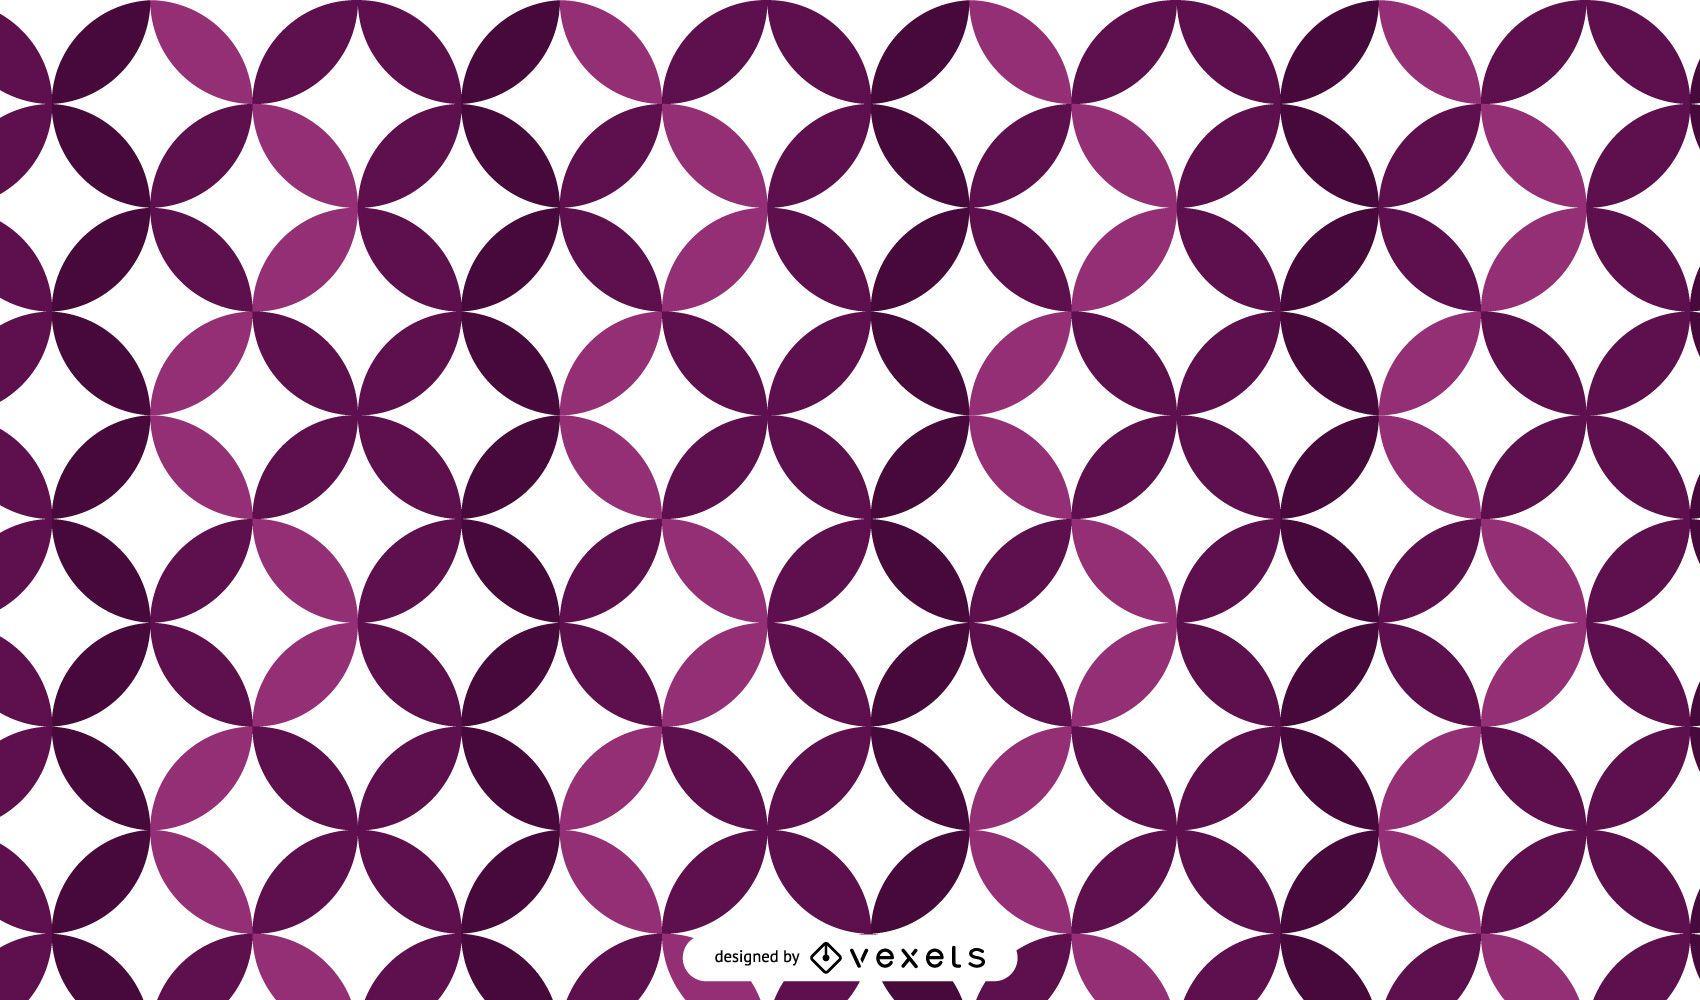 Fondo de mosaico púrpura brillante